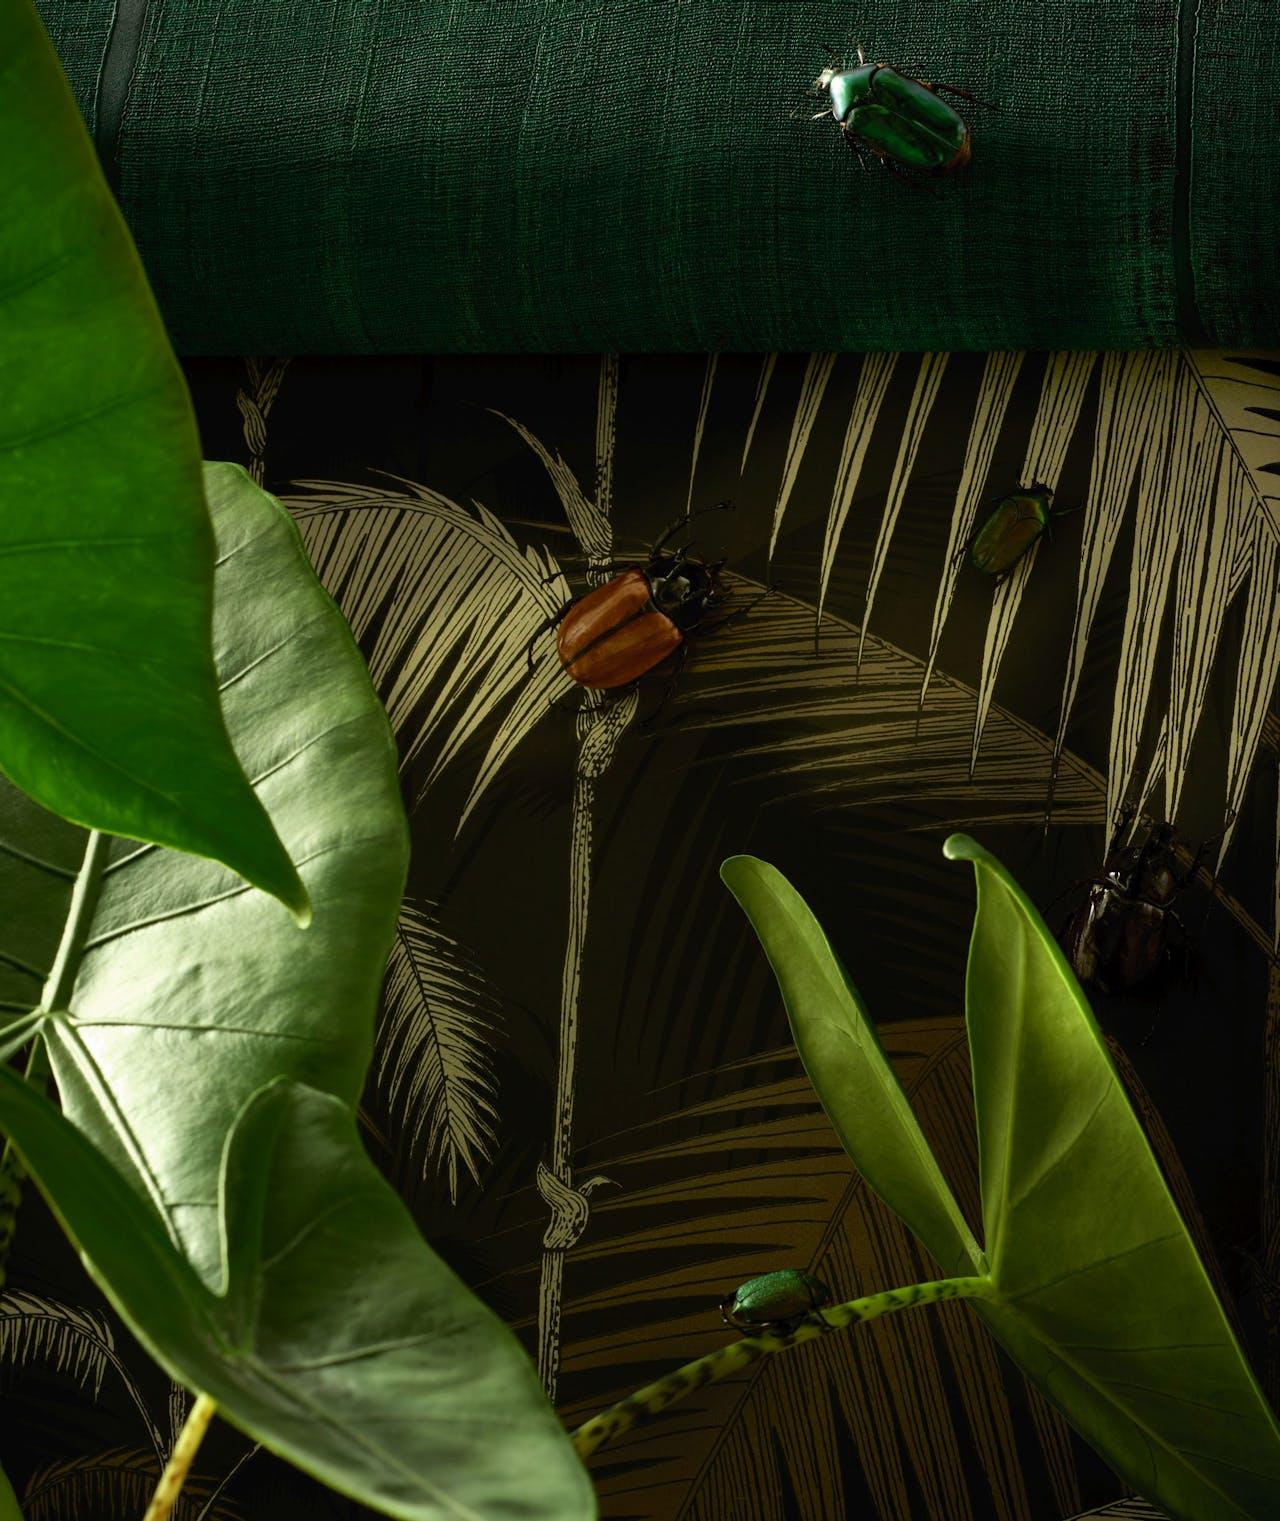 1. Behang 'Elitis Sari', €191, Nomades Collectie via Luxury By Nature; 2. Diverse kevers vanaf €13, Stenelux; 3. Behang 'Palm Jungle', €124, Cole & Son via Luxury By Nature; 4. Plant alocasia zebrina, mooiwatplantendoen.nl. ➜ Zie verkoopinformatie op pagina 95.